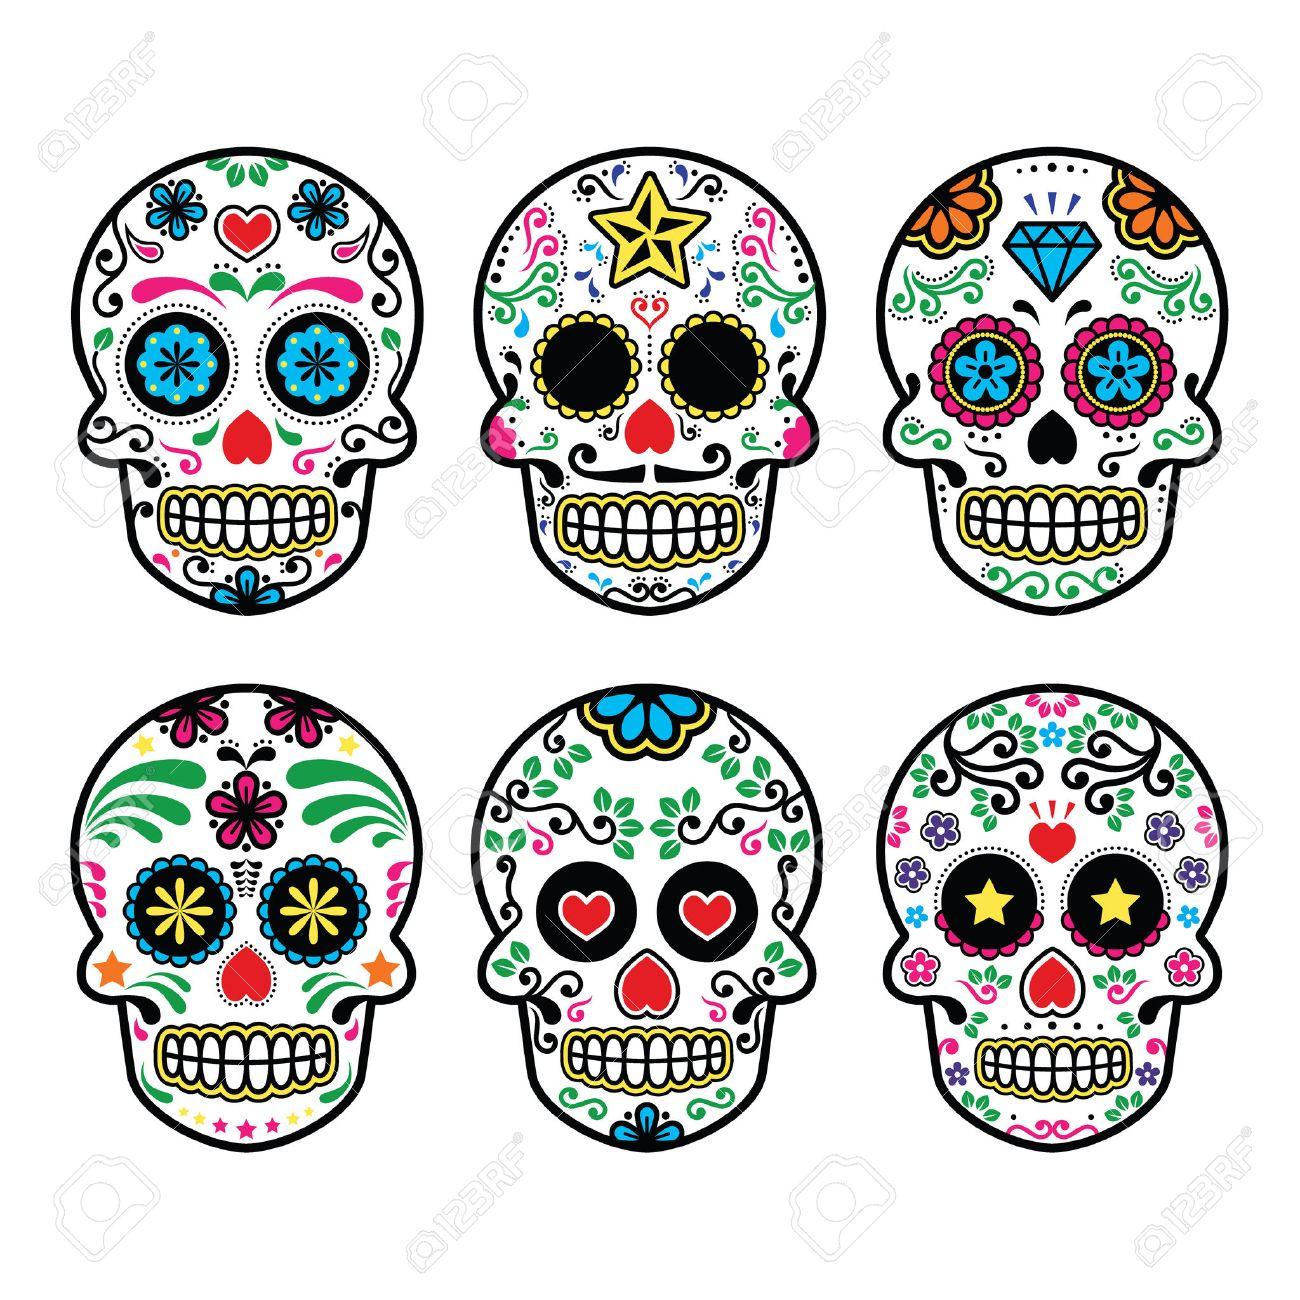 Mexican sugar skull, Dia de los Muertos icons set on white background.